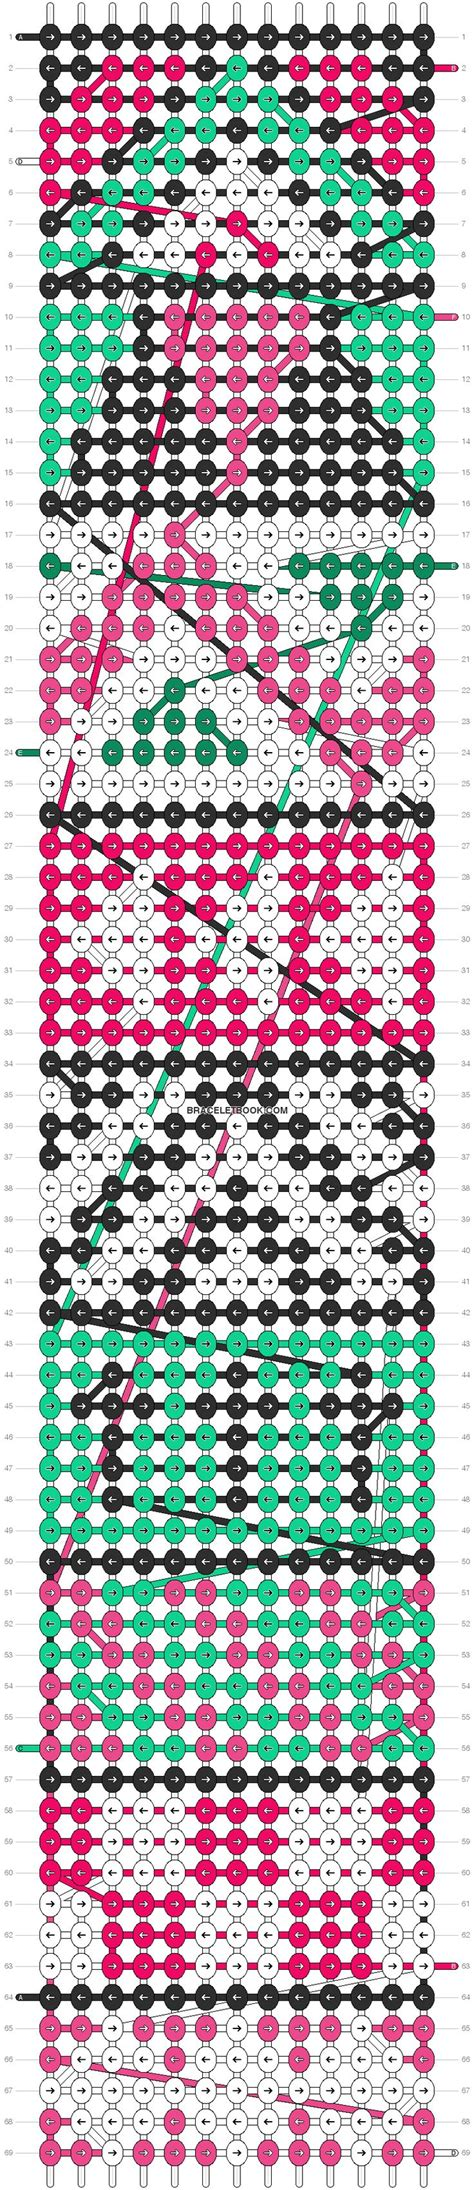 tribal pattern tutorial aztec tribal friendship bracelet pattern number 10821